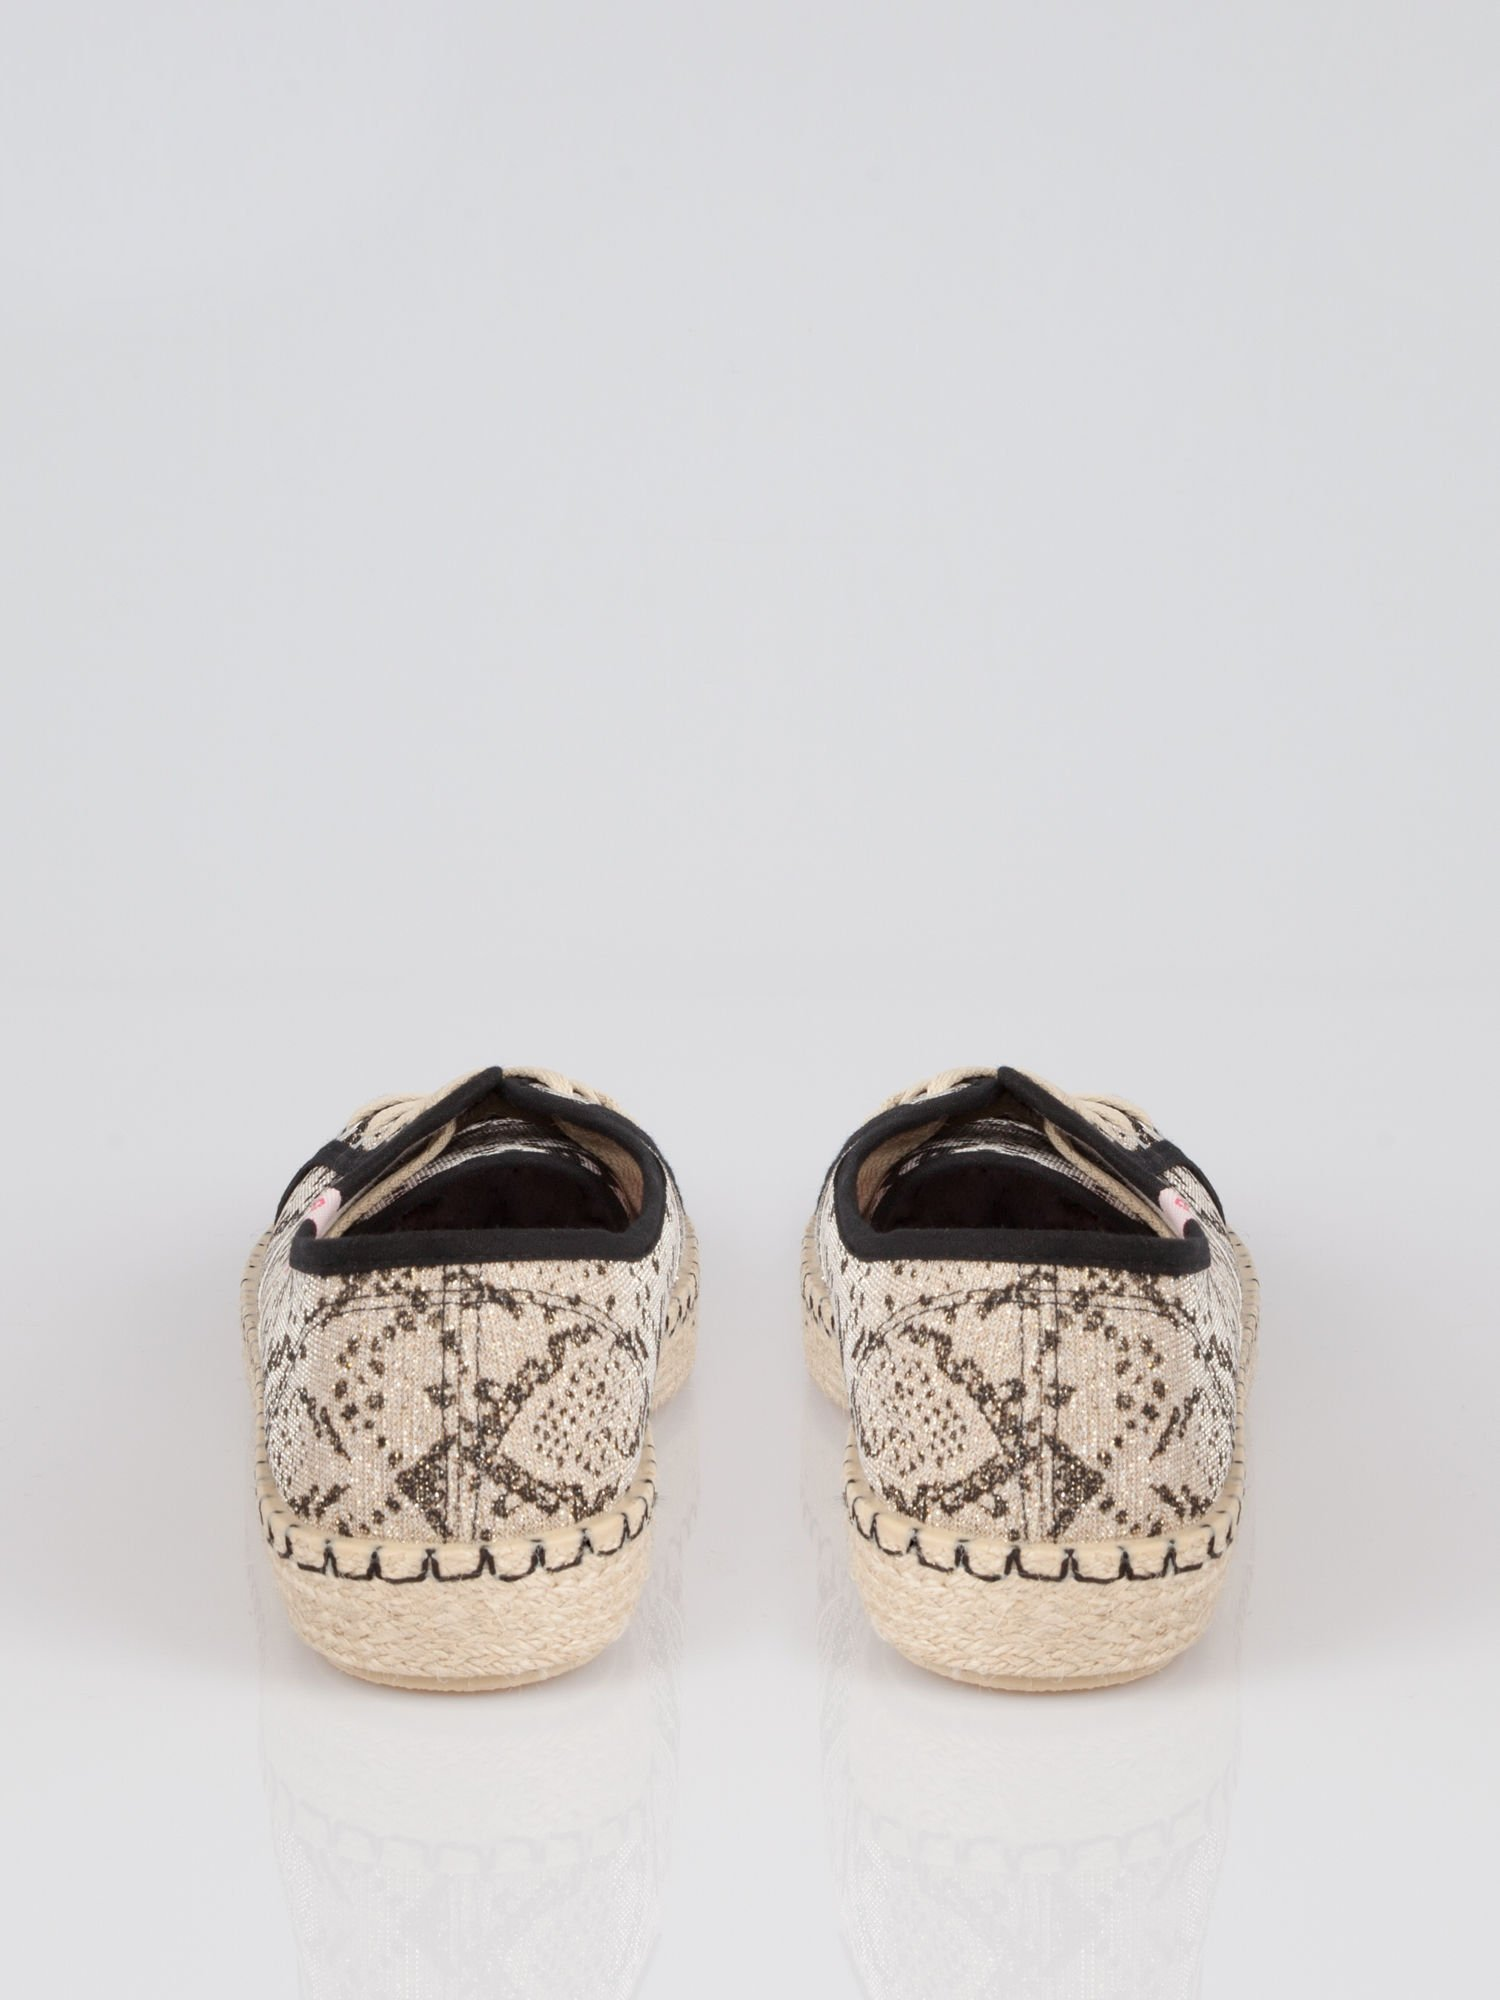 Czarne epadryle typu trampki z motywem glitter snake print Keiko                                  zdj.                                  3